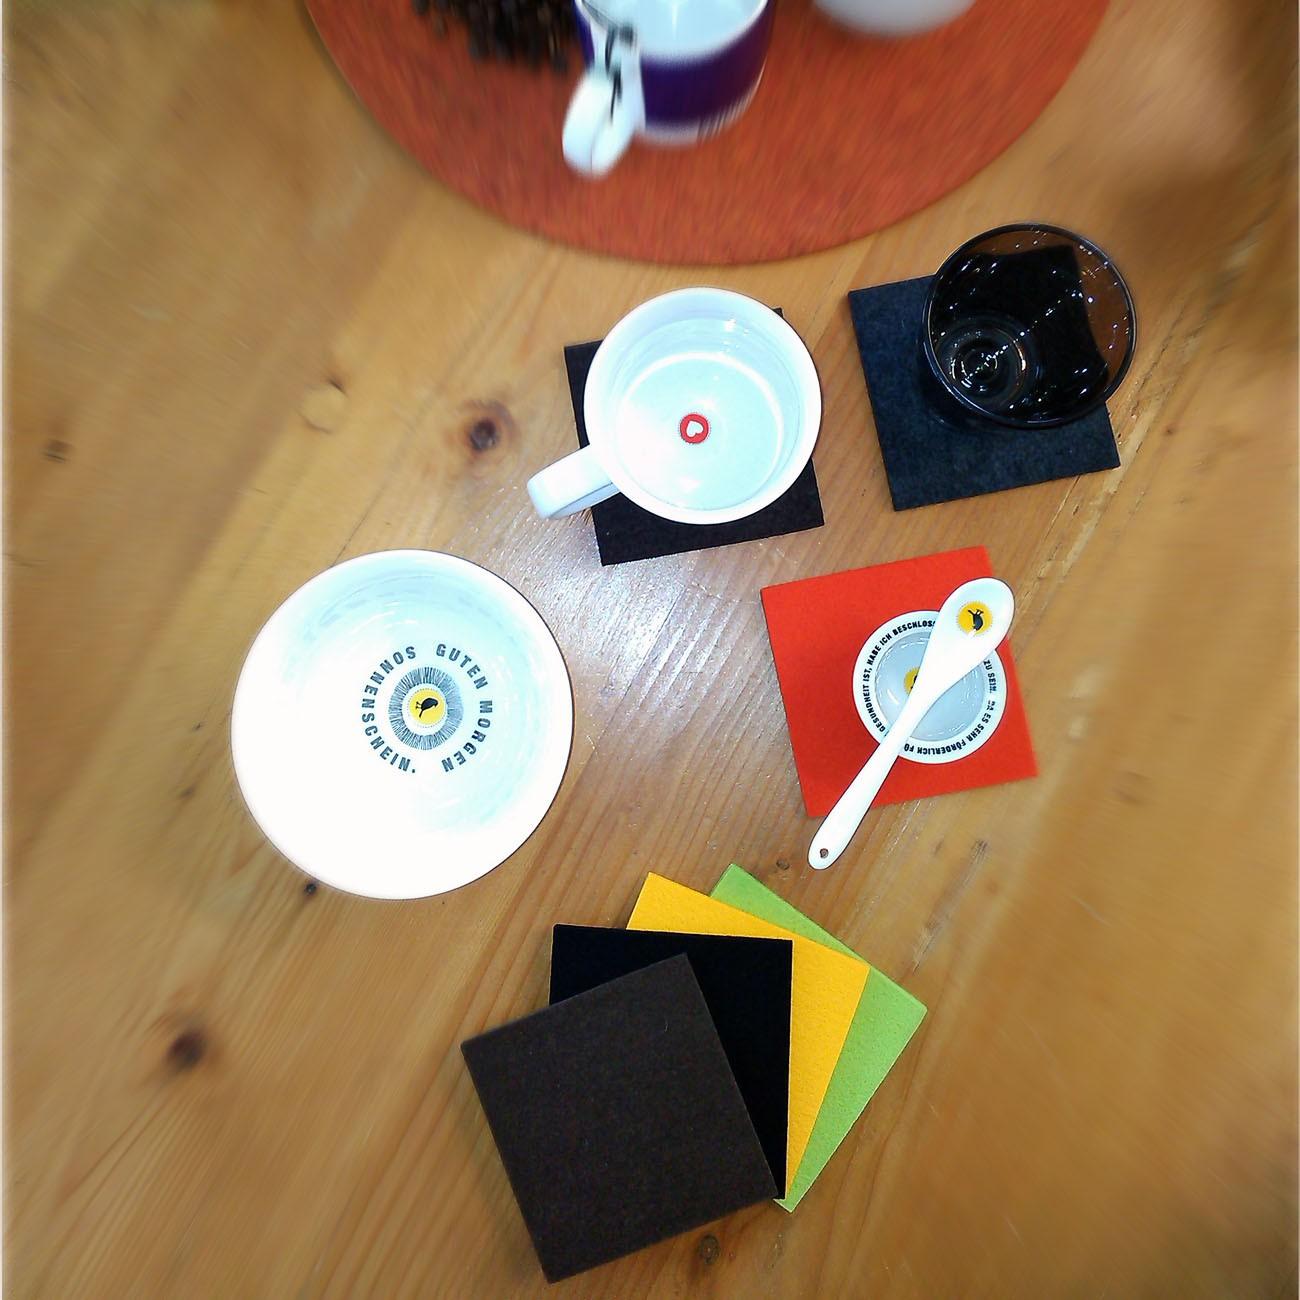 daff untersetzer 10x10 cm quadratisch aus merino filz. Black Bedroom Furniture Sets. Home Design Ideas